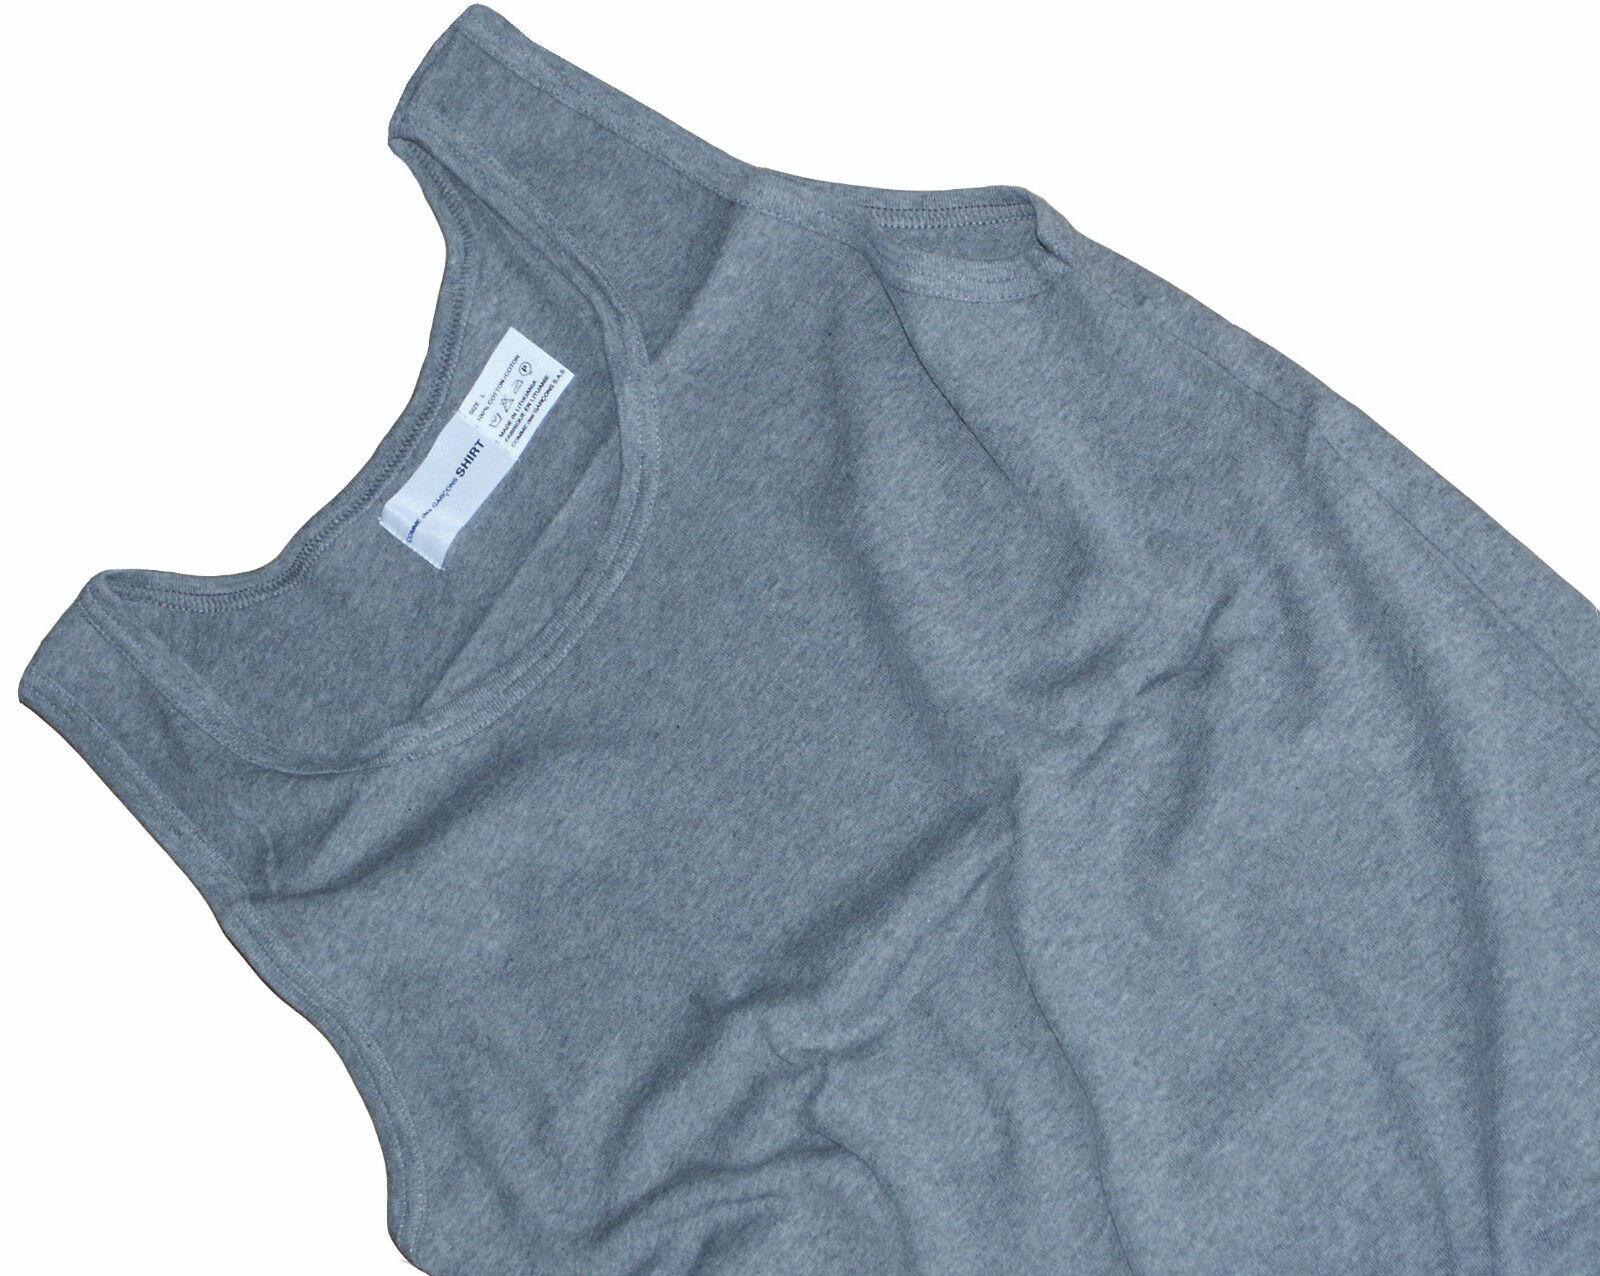 COMME des GARCONS SHIRT COTTON SLEEVELESS T-SHIRT   TANK TOP RARE XL fitted